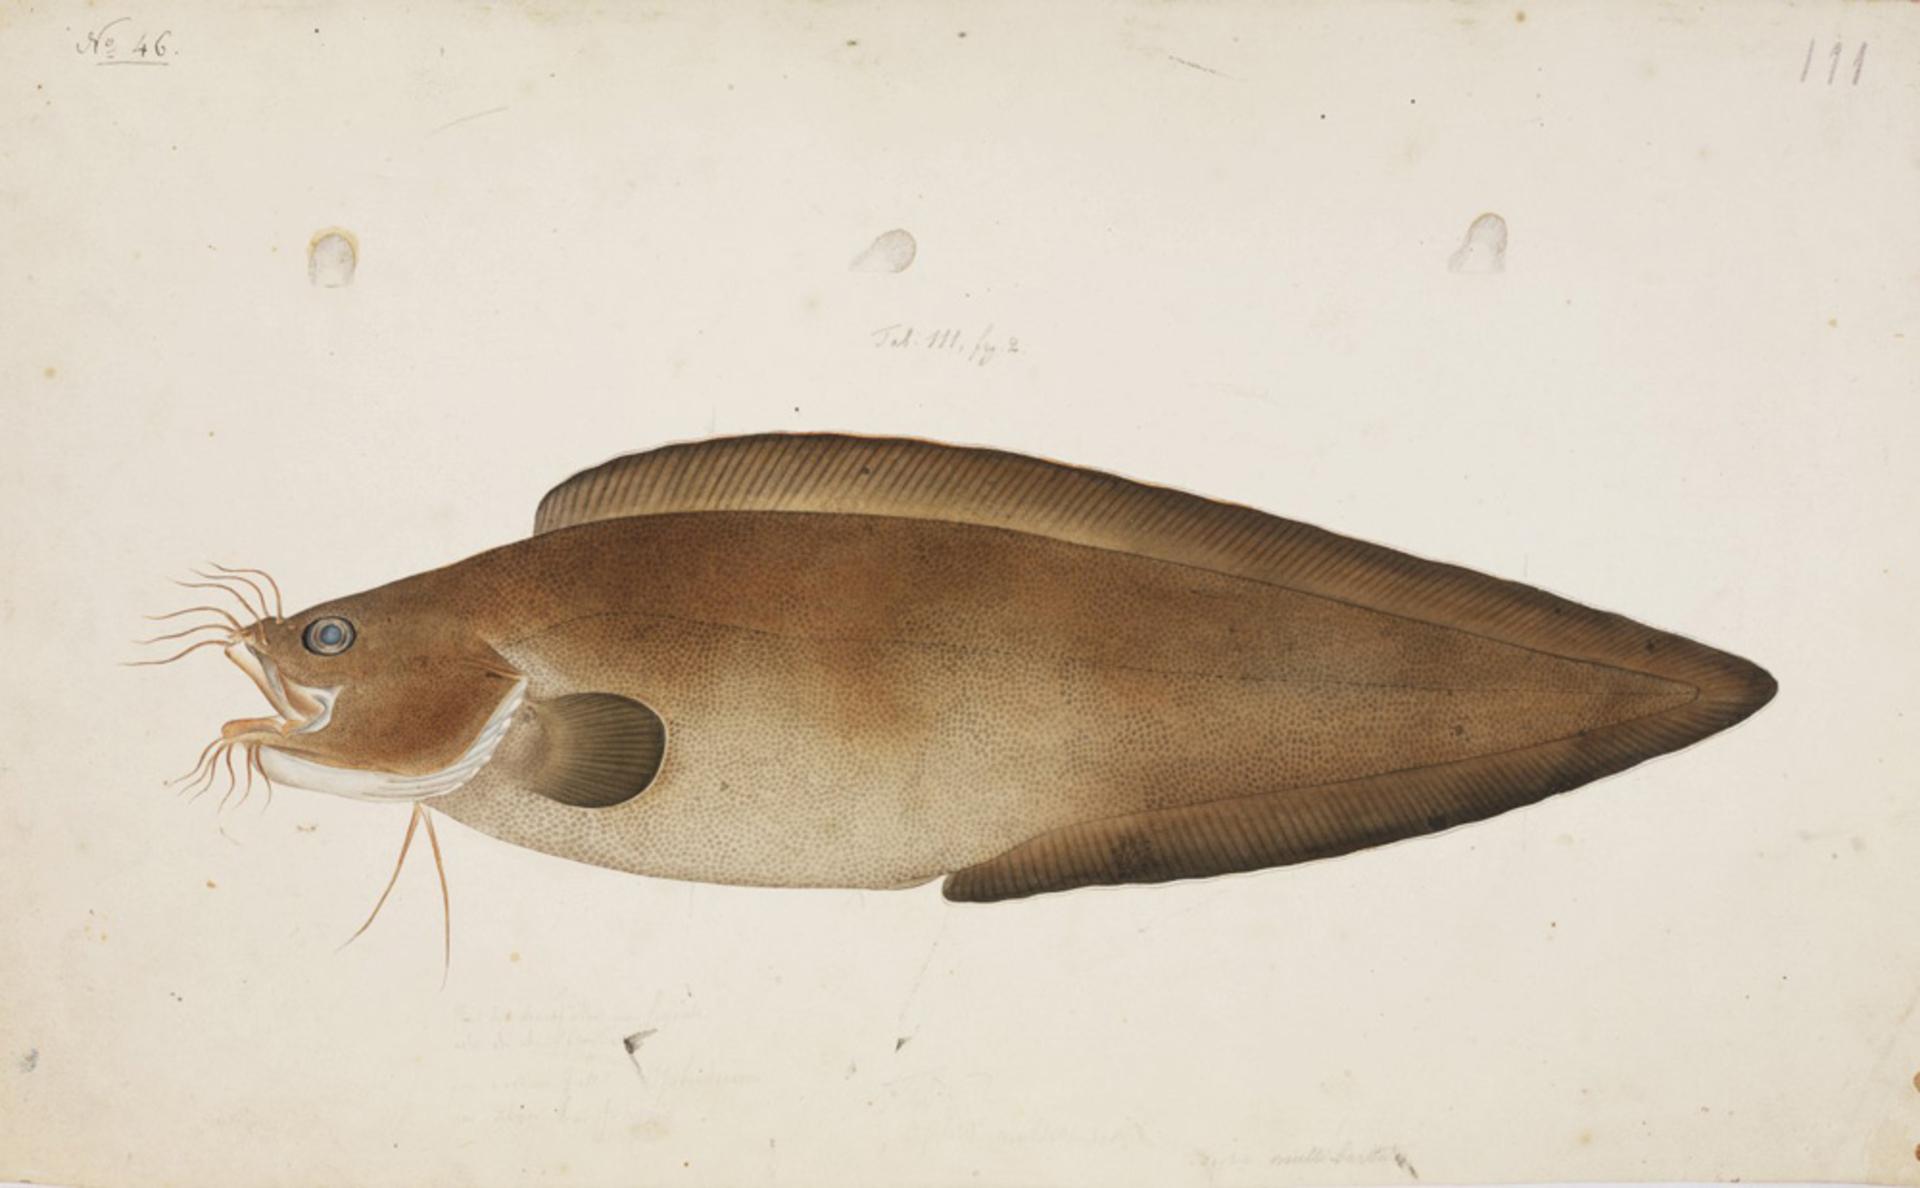 RMNH.ART.38   Brotula multibarbata